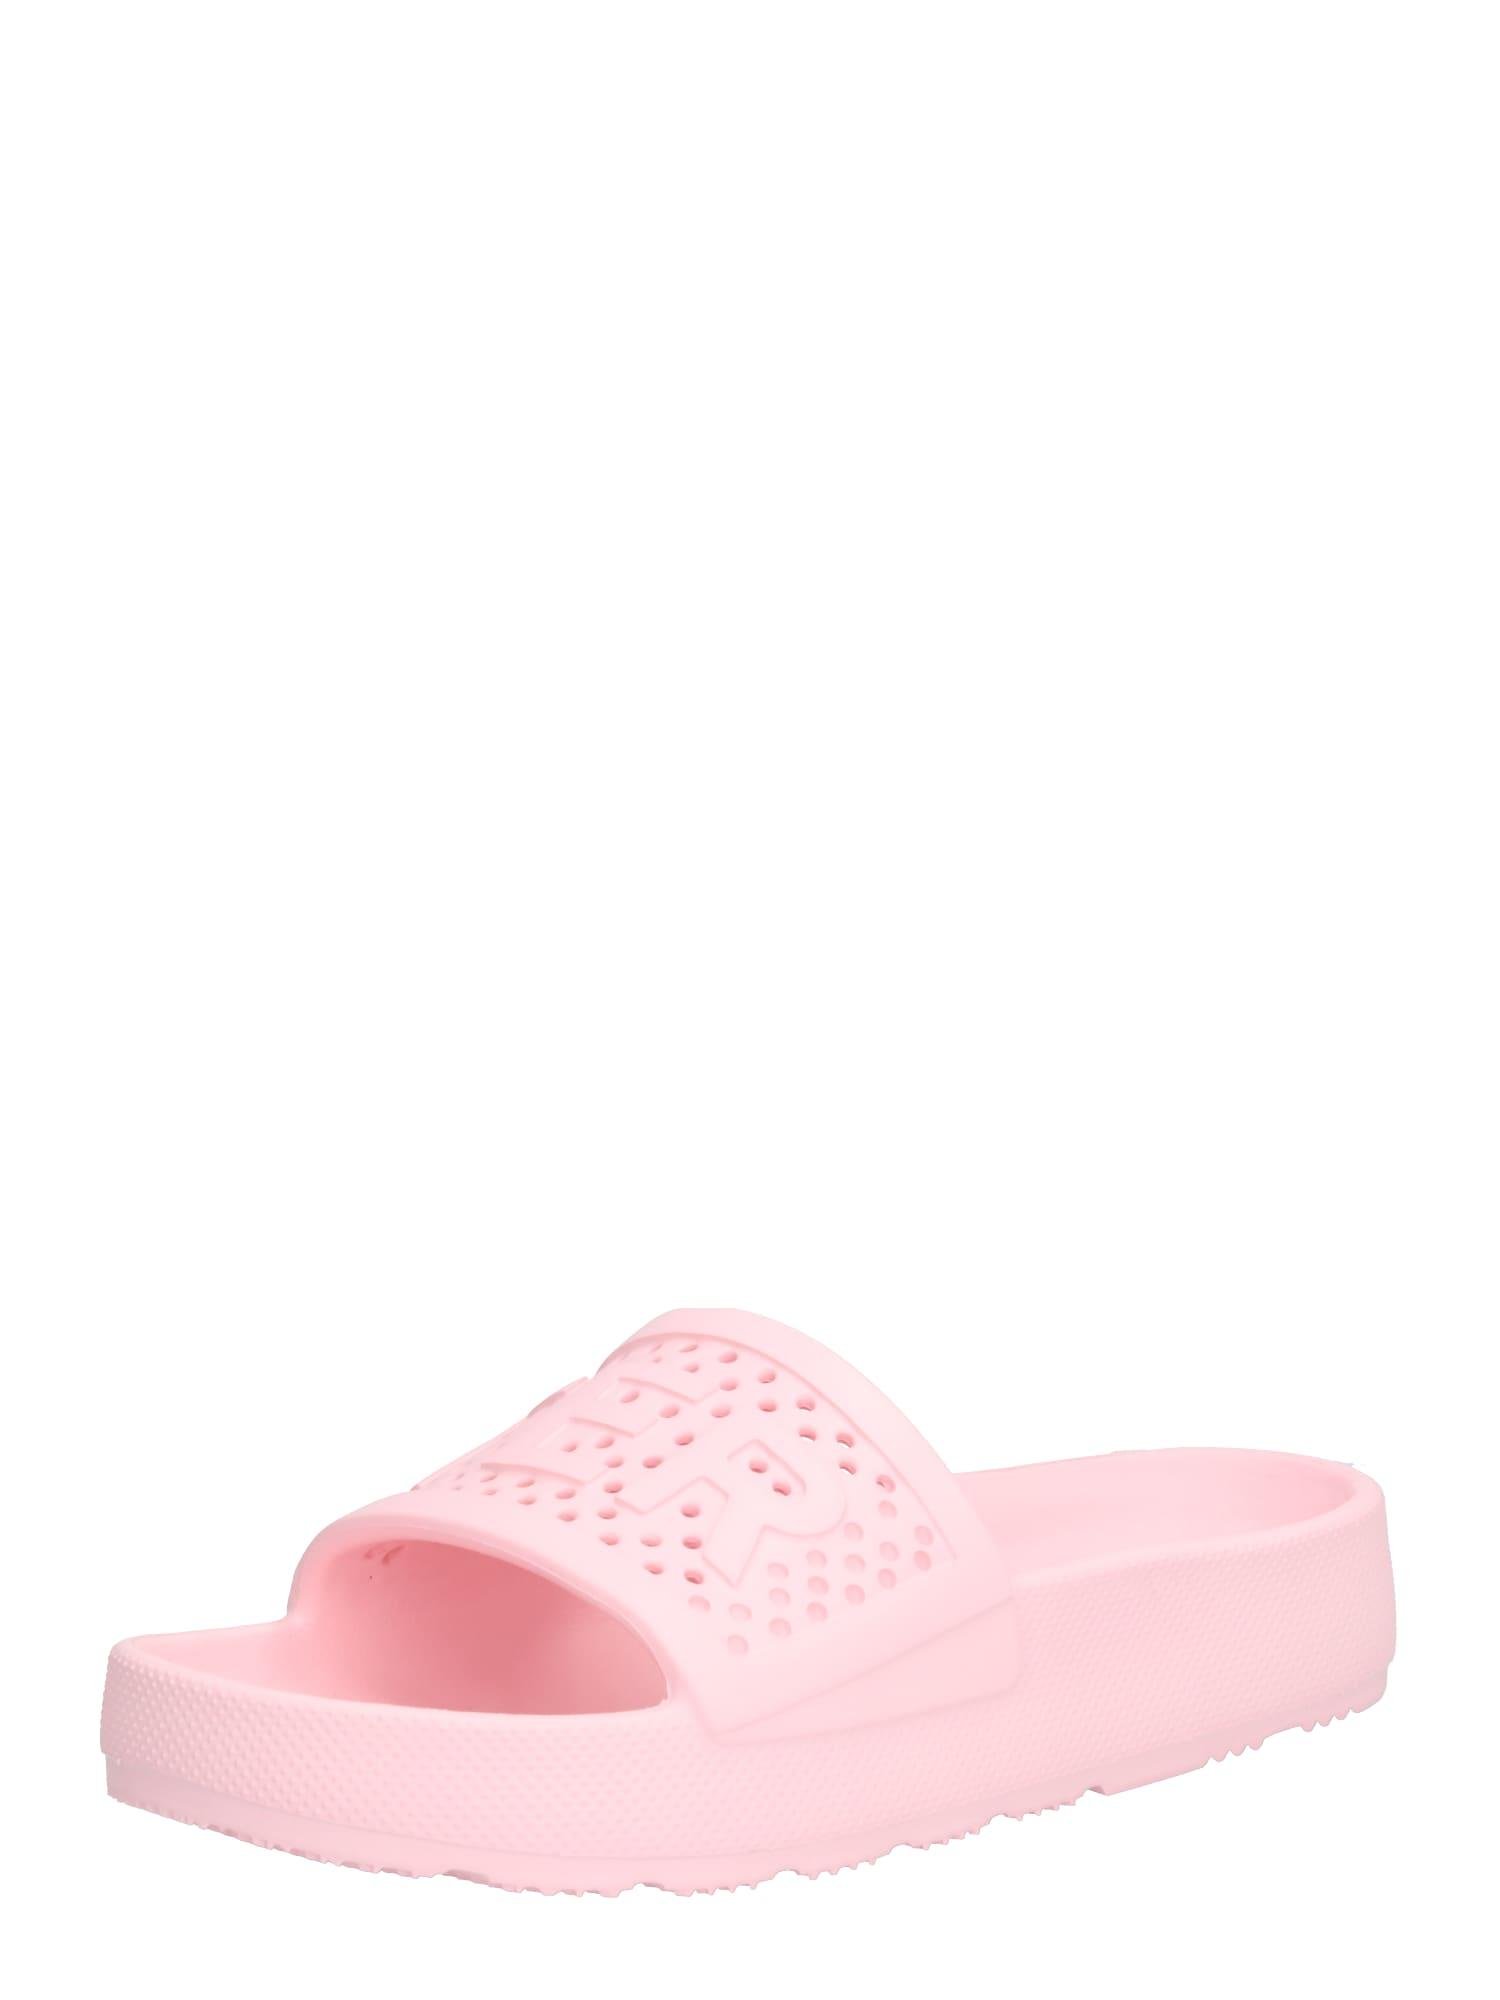 Pantofle Womens Original light weight moulded slide růžová HUNTER